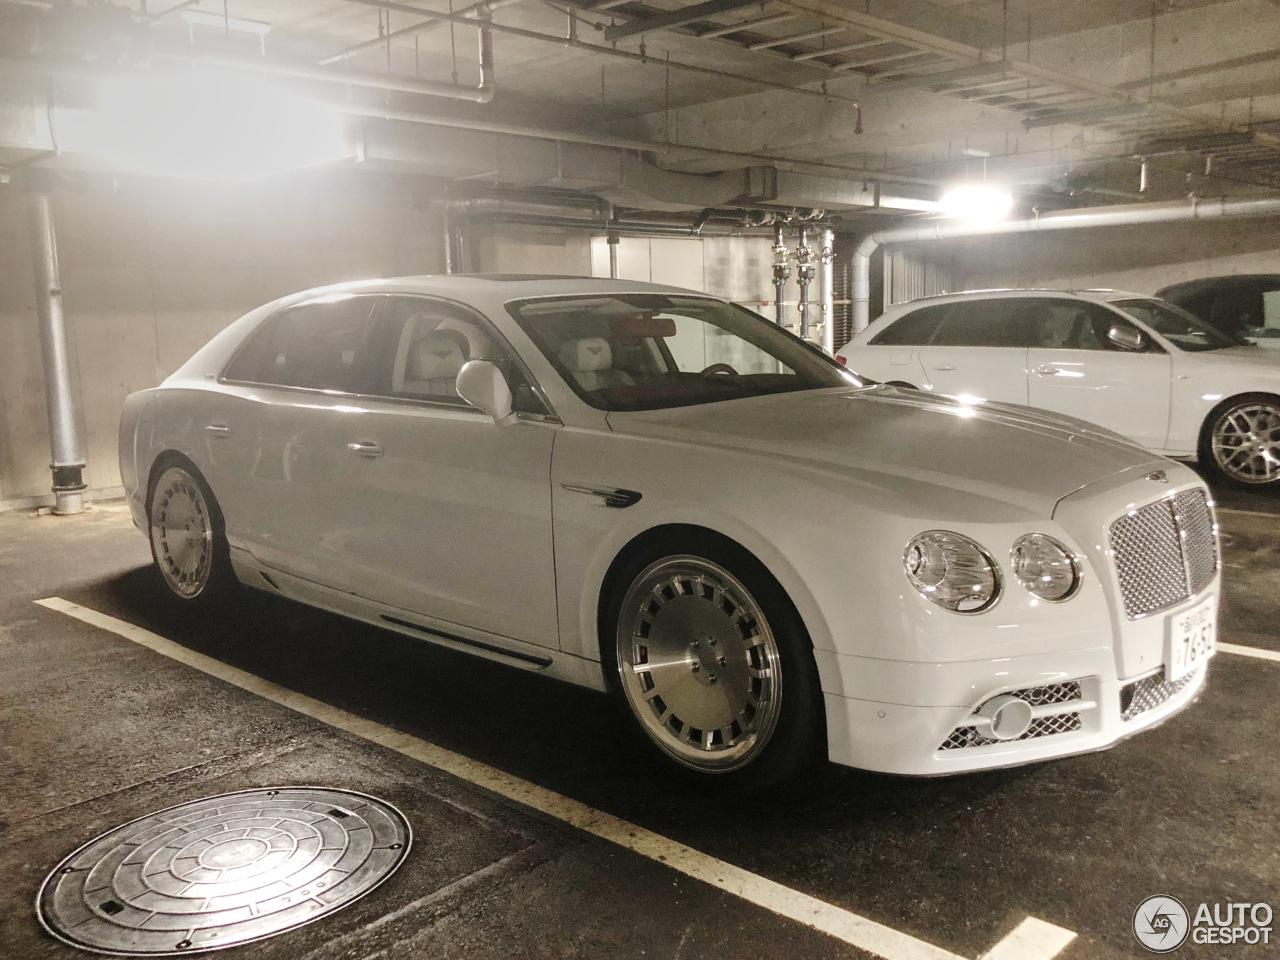 Bentley Mansory Flying Spur W12 17 June 2018 Autogespot